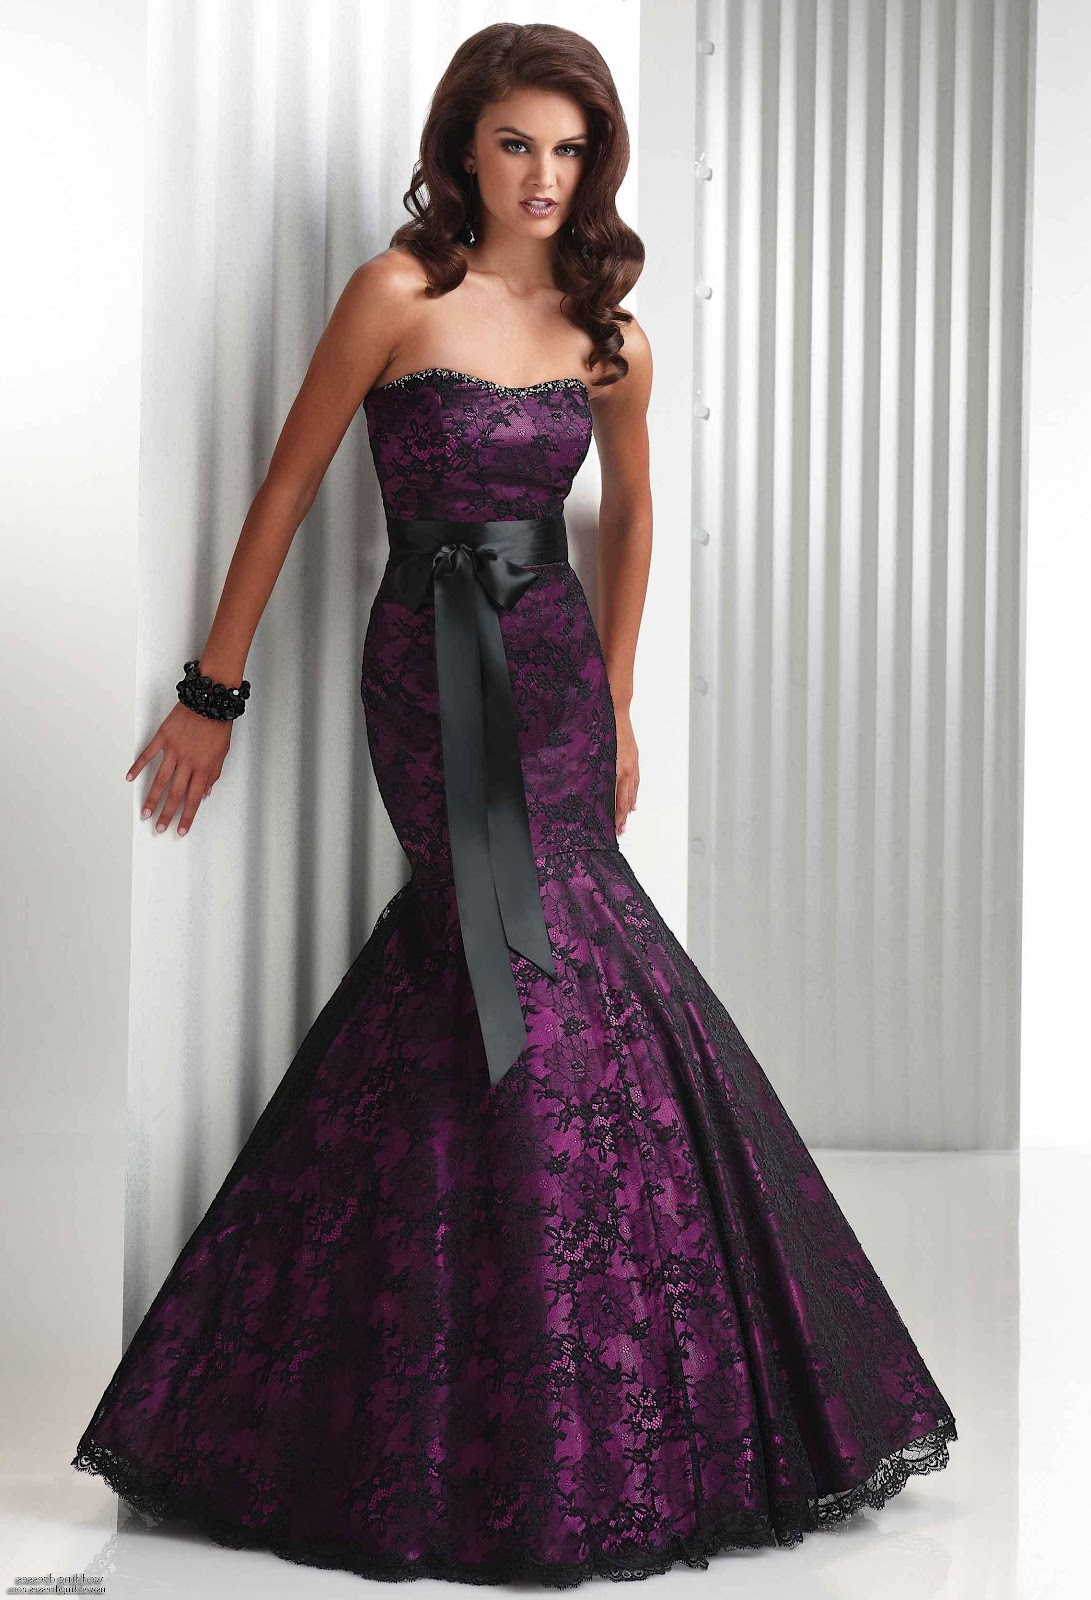 Wilmide 39 s blog black gothic wedding dresses for Black gothic wedding dress